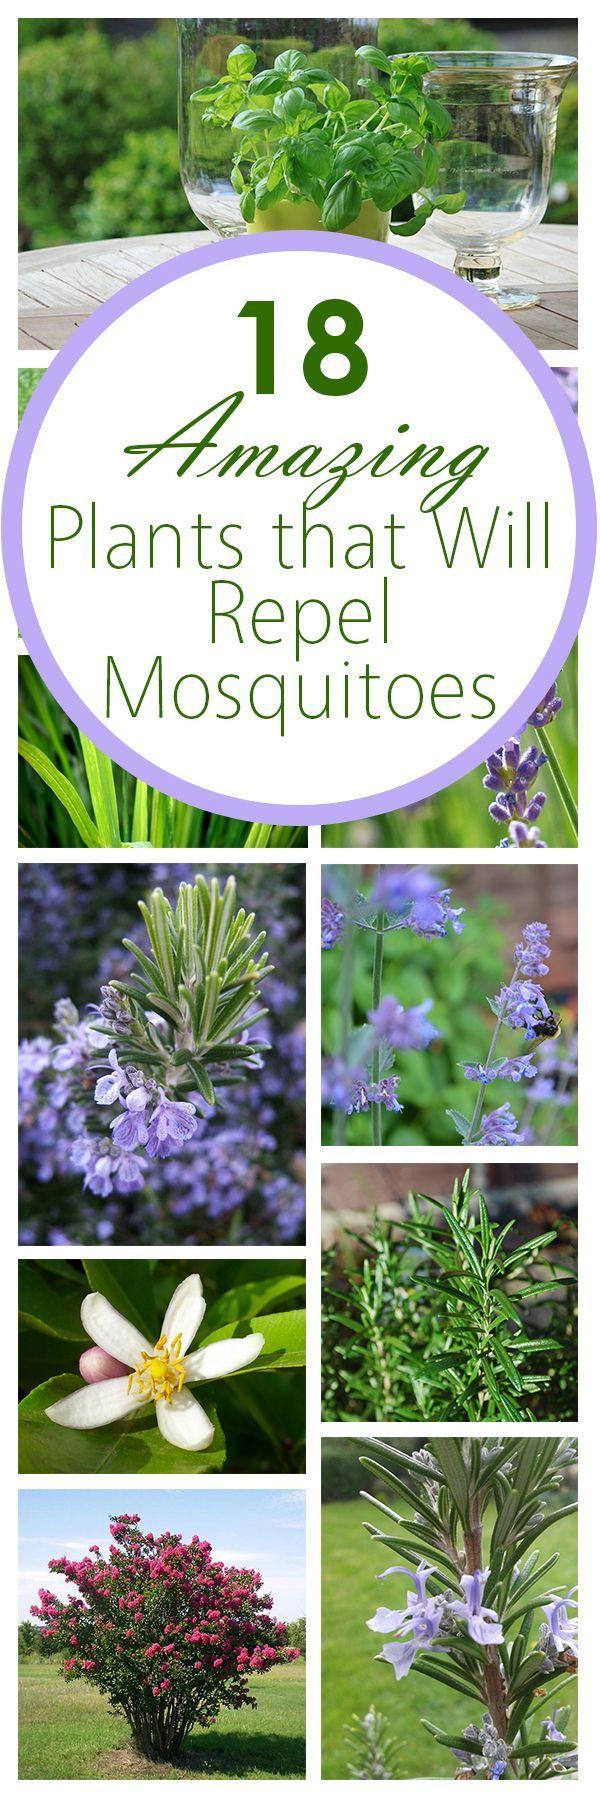 control natural de plagas, control de mosquitos, repelente natural de mosquitos, los cortes de jardinería, control de plagas de jardín, consejos y trucos, consejos de jardinería y trucos, pin populares